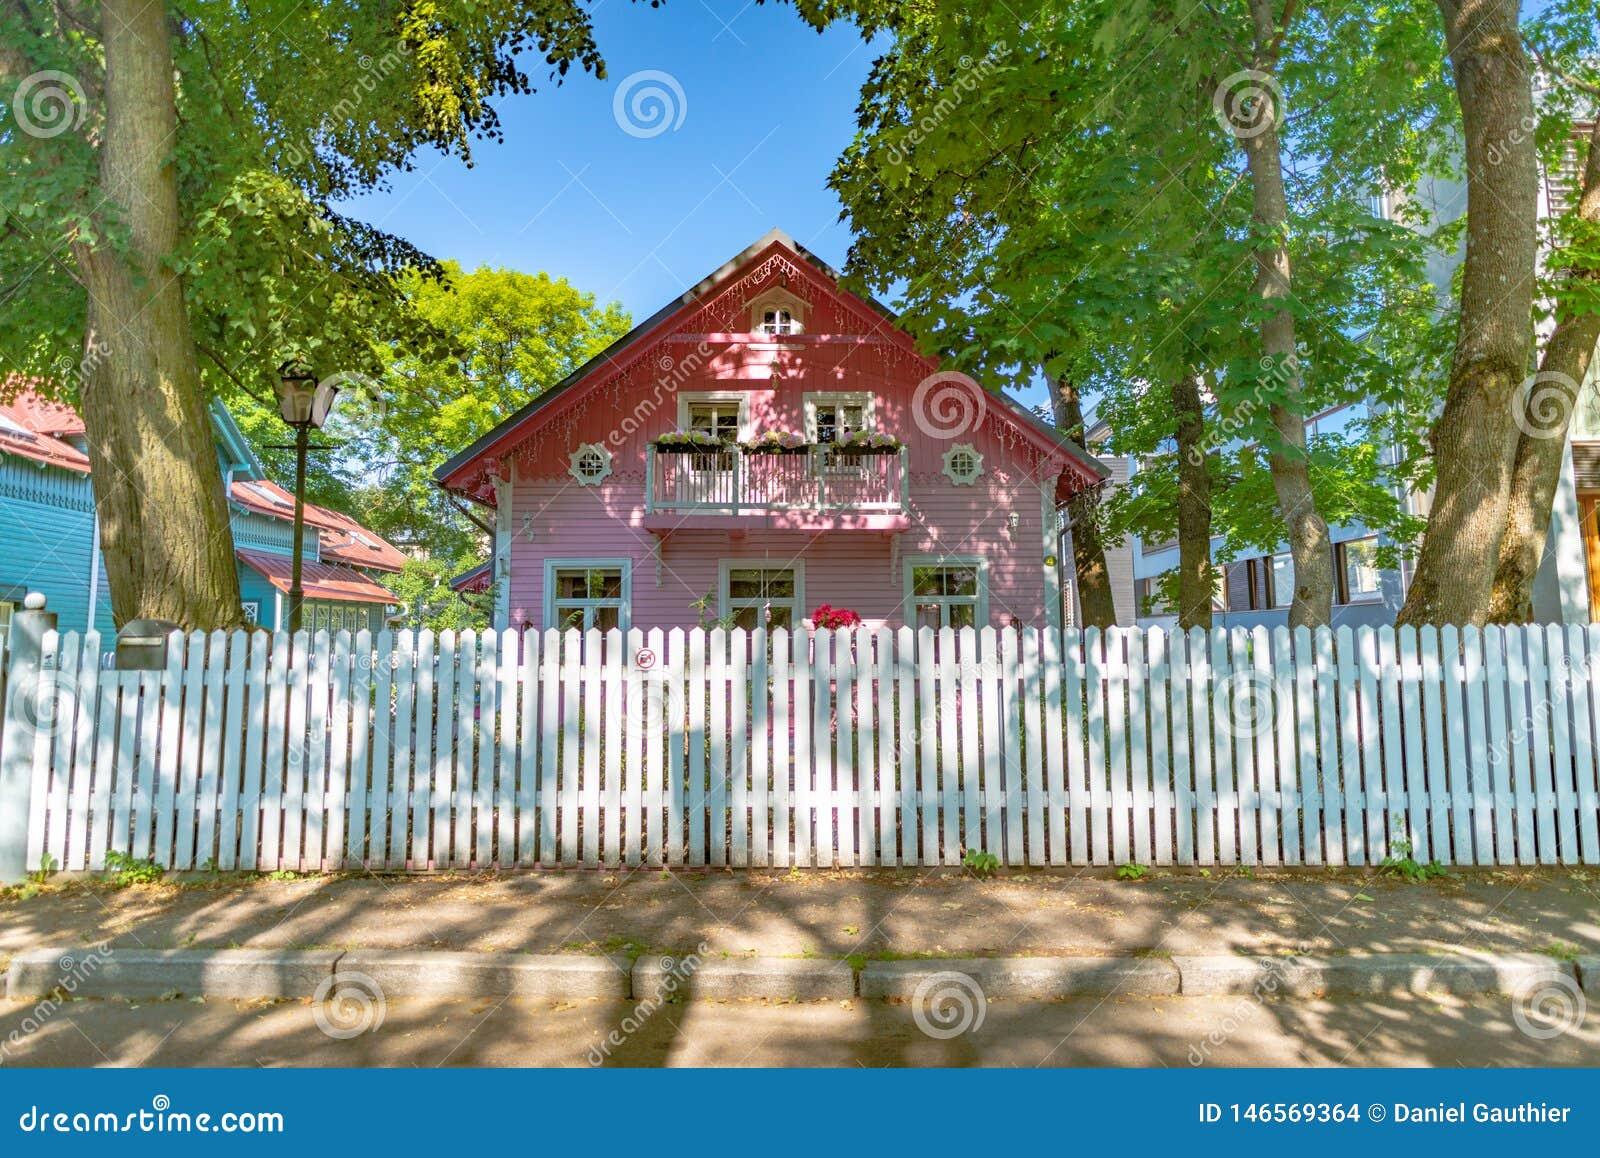 Rosa tr?hus n?ra Kadriorg slotttr?dg?rdar, Tallinn, Estland